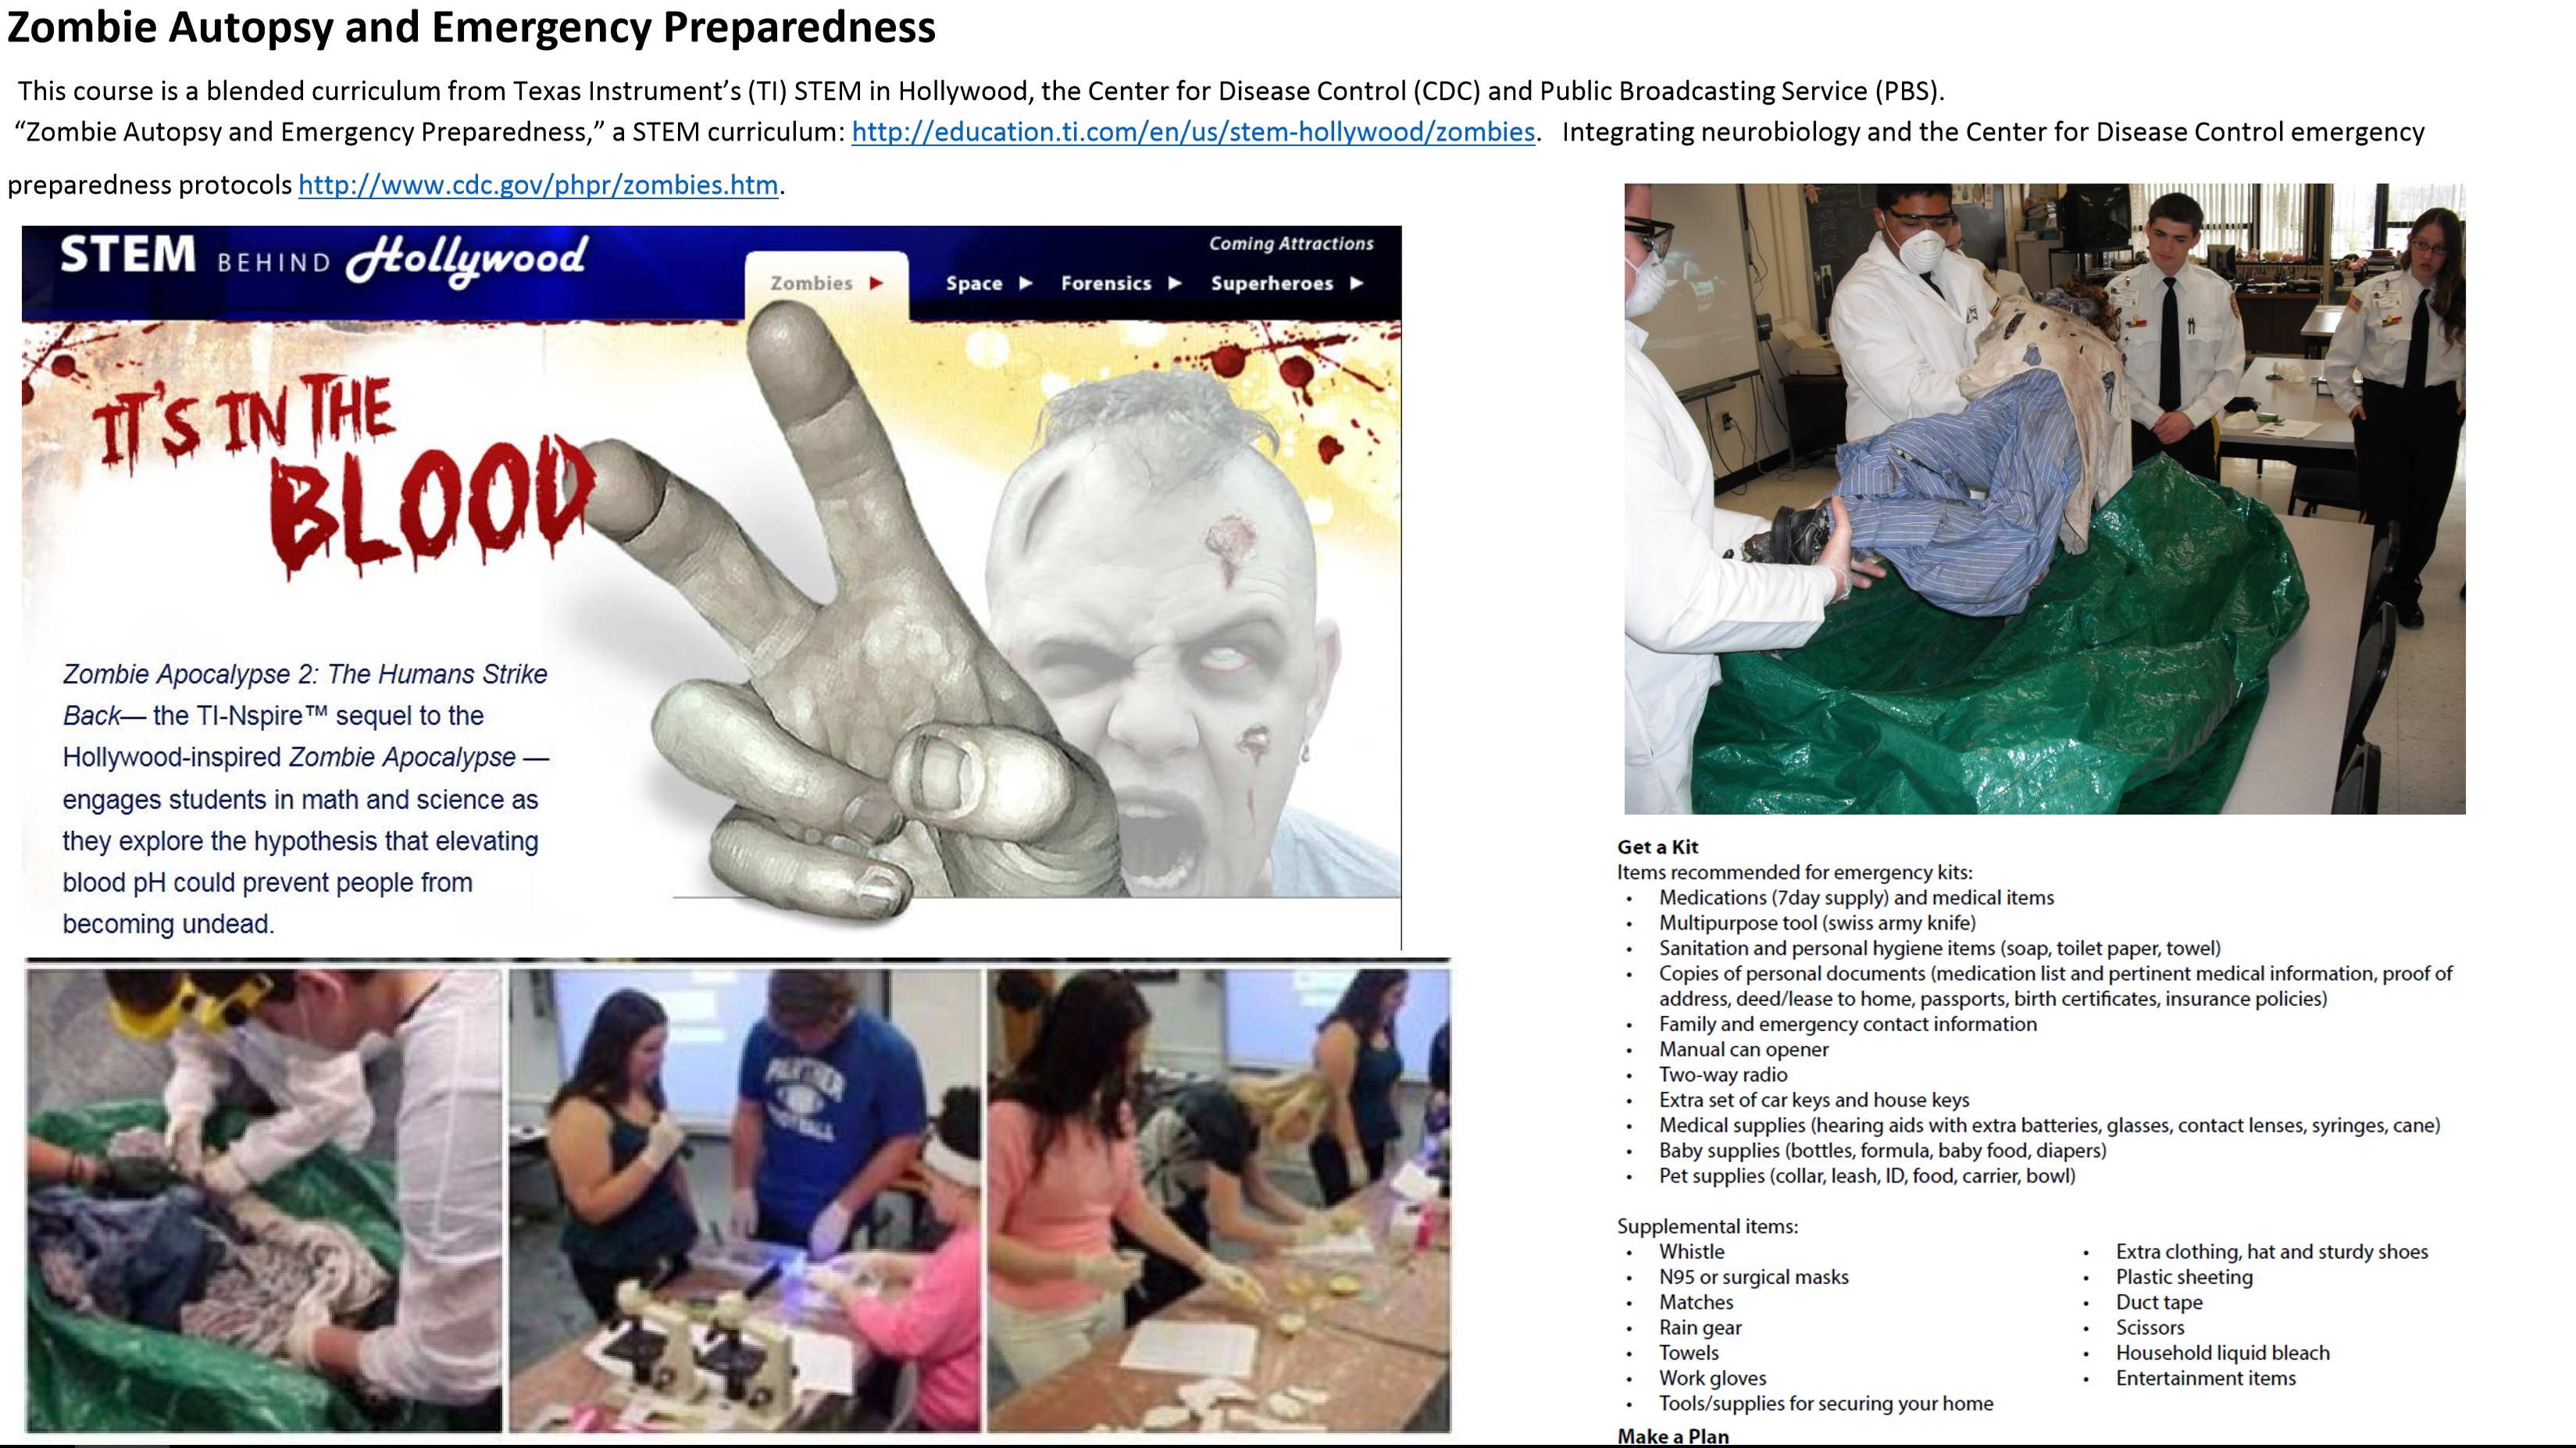 Zombie Autopsy and Emergency Preparedness